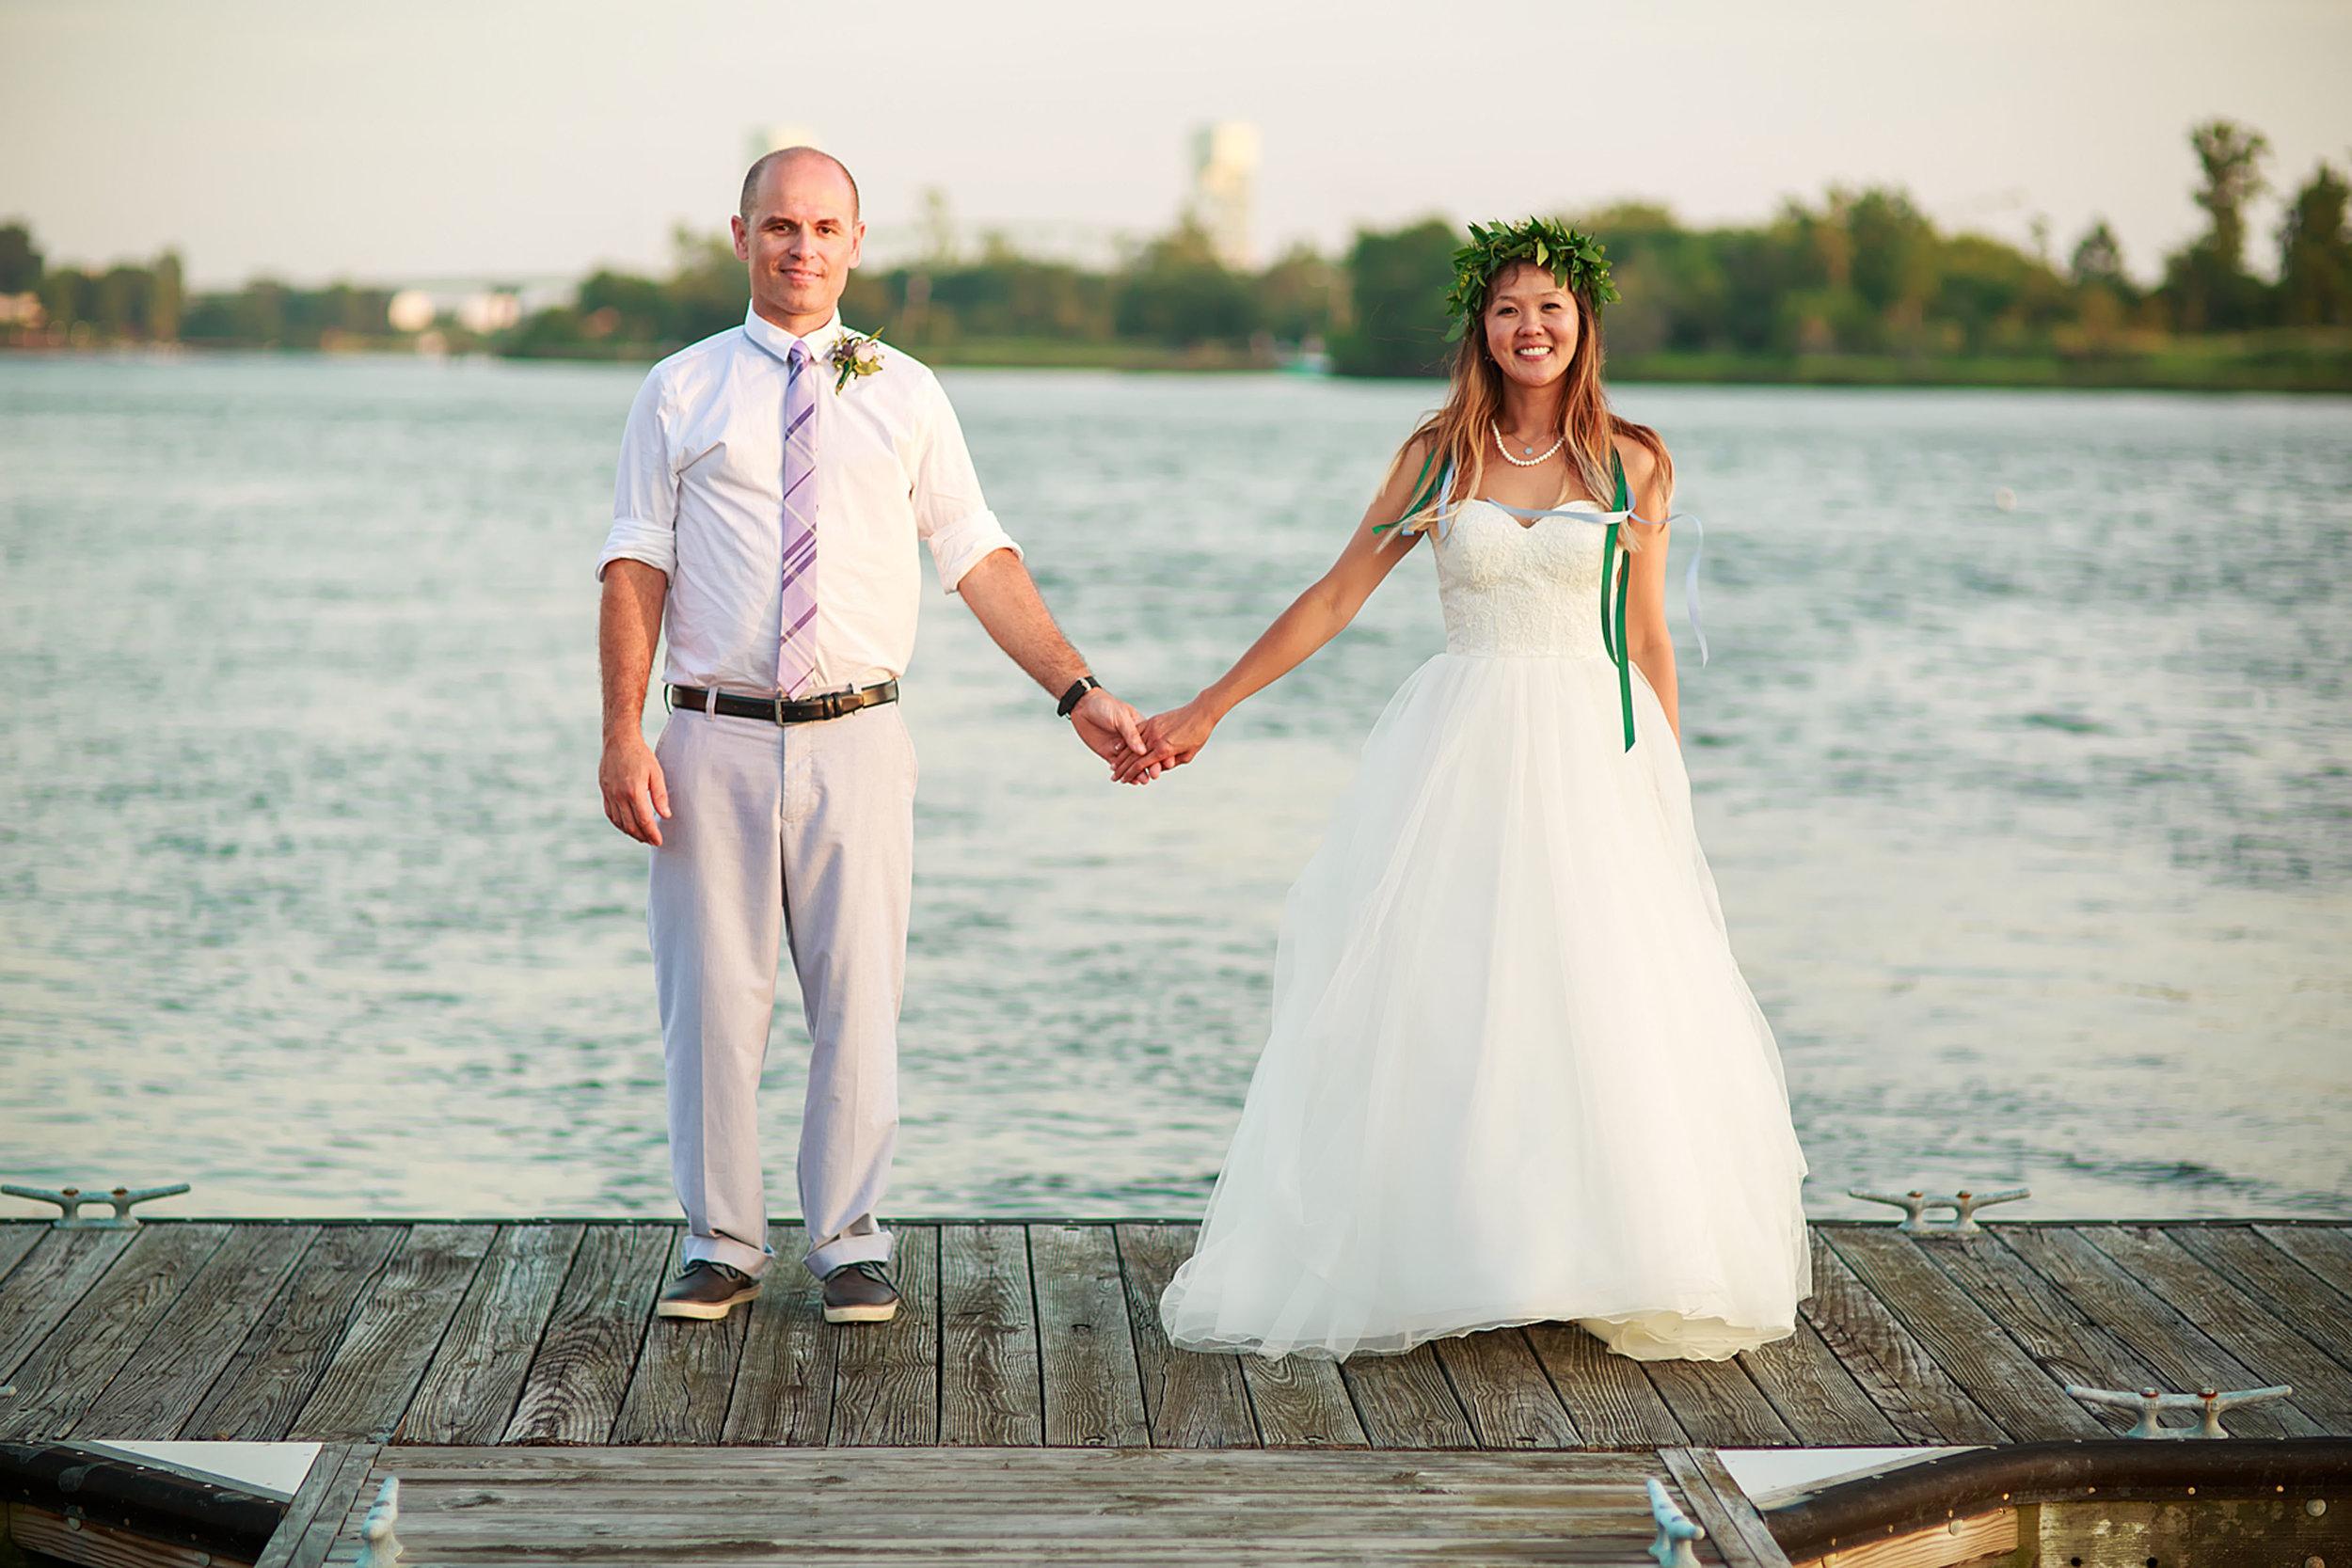 North_Carolina_Wedding_Photographer_Tiffany_Abruzzo_Bride&Groom_41.jpg